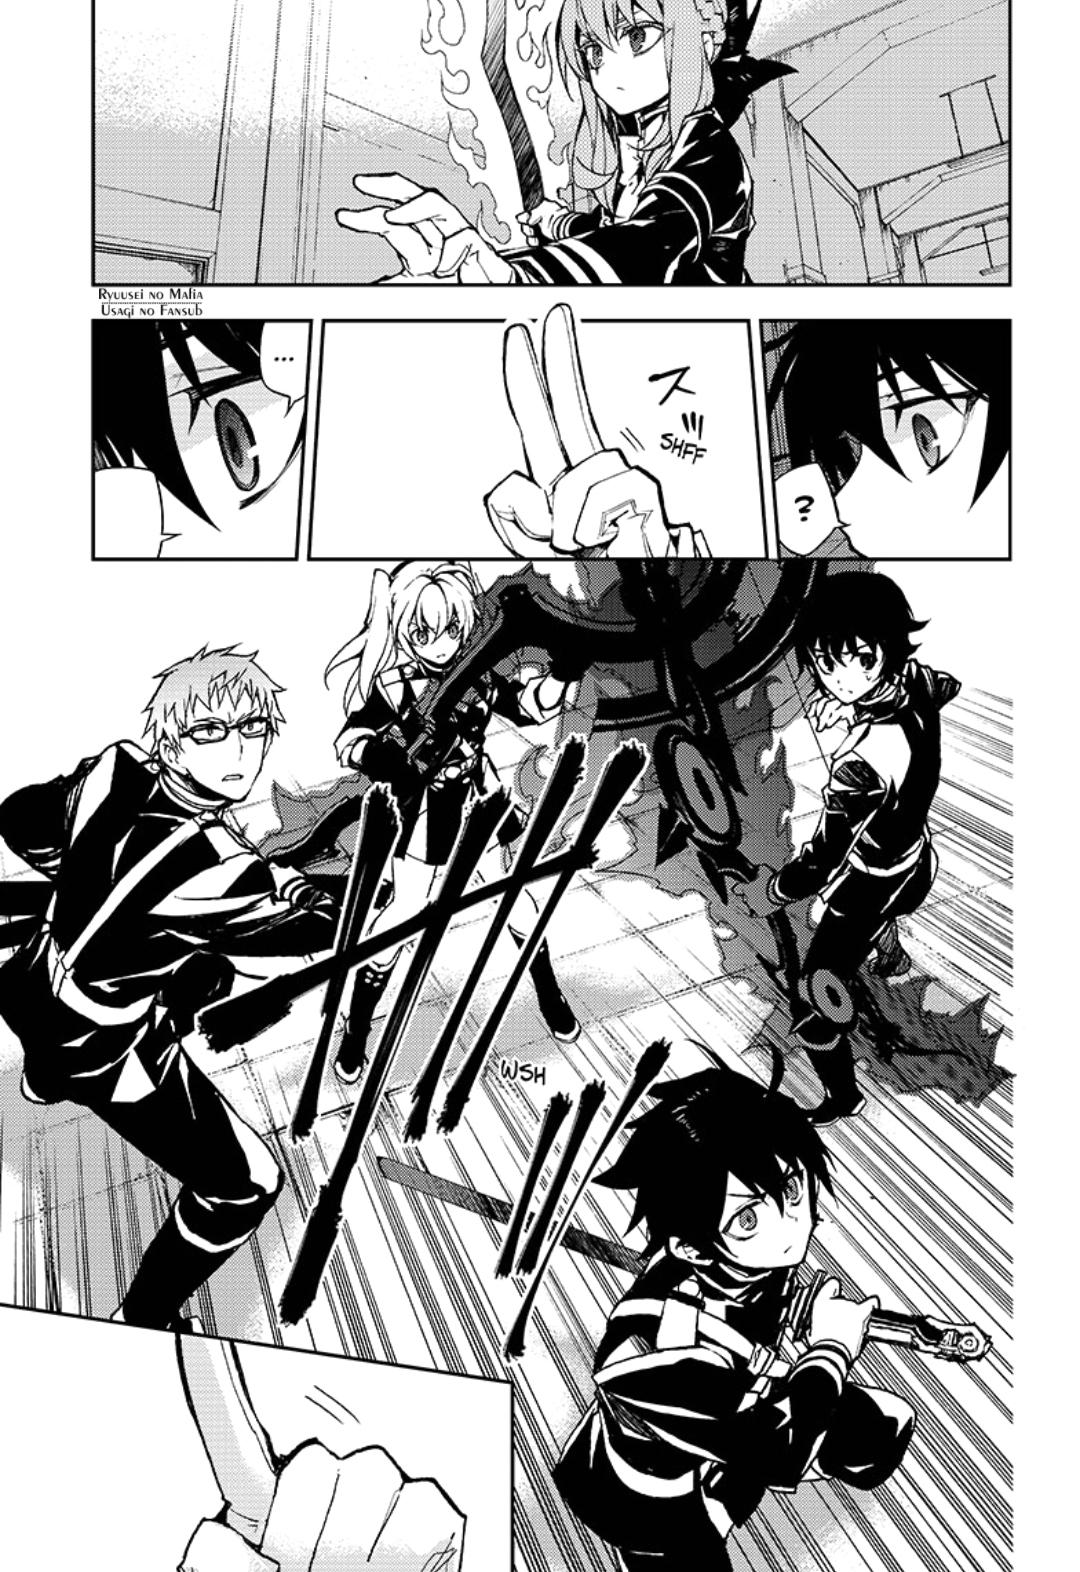 http://c5.ninemanga.com/es_manga/49/3057/354600/23e140a848564d0d992c874d4cea766b.jpg Page 8